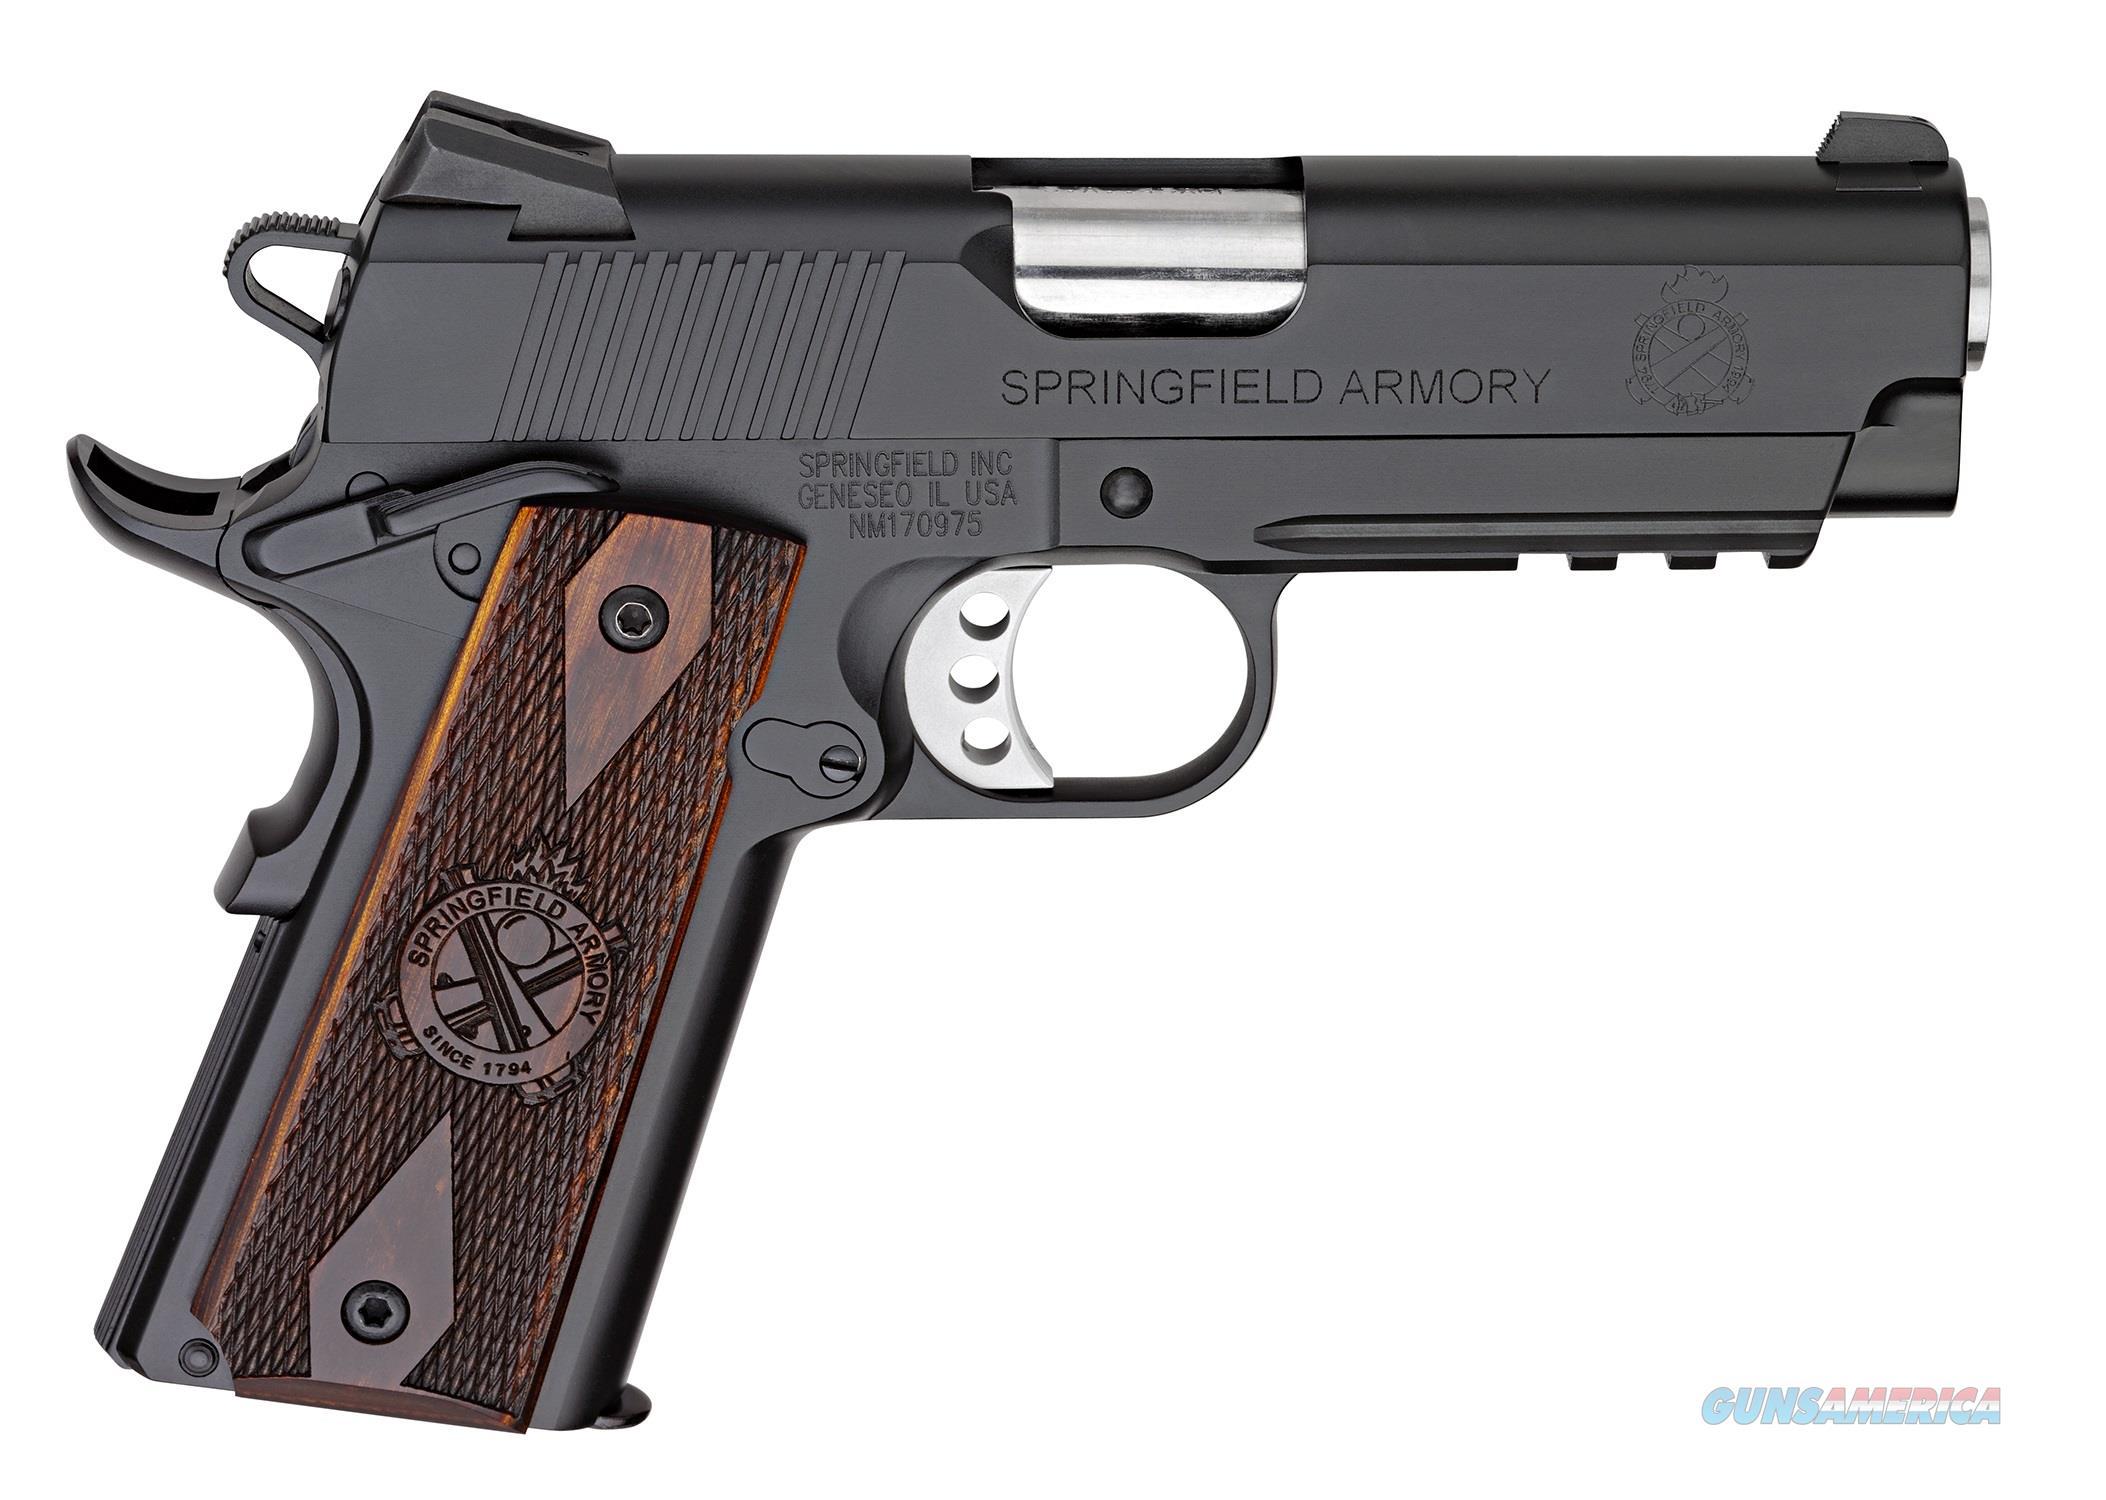 Springfield Armory PX9115L18 1911 Champion Operator Lightweight  45 Automatic Colt Pistol (ACP)  Guns > Pistols > S Misc Pistols